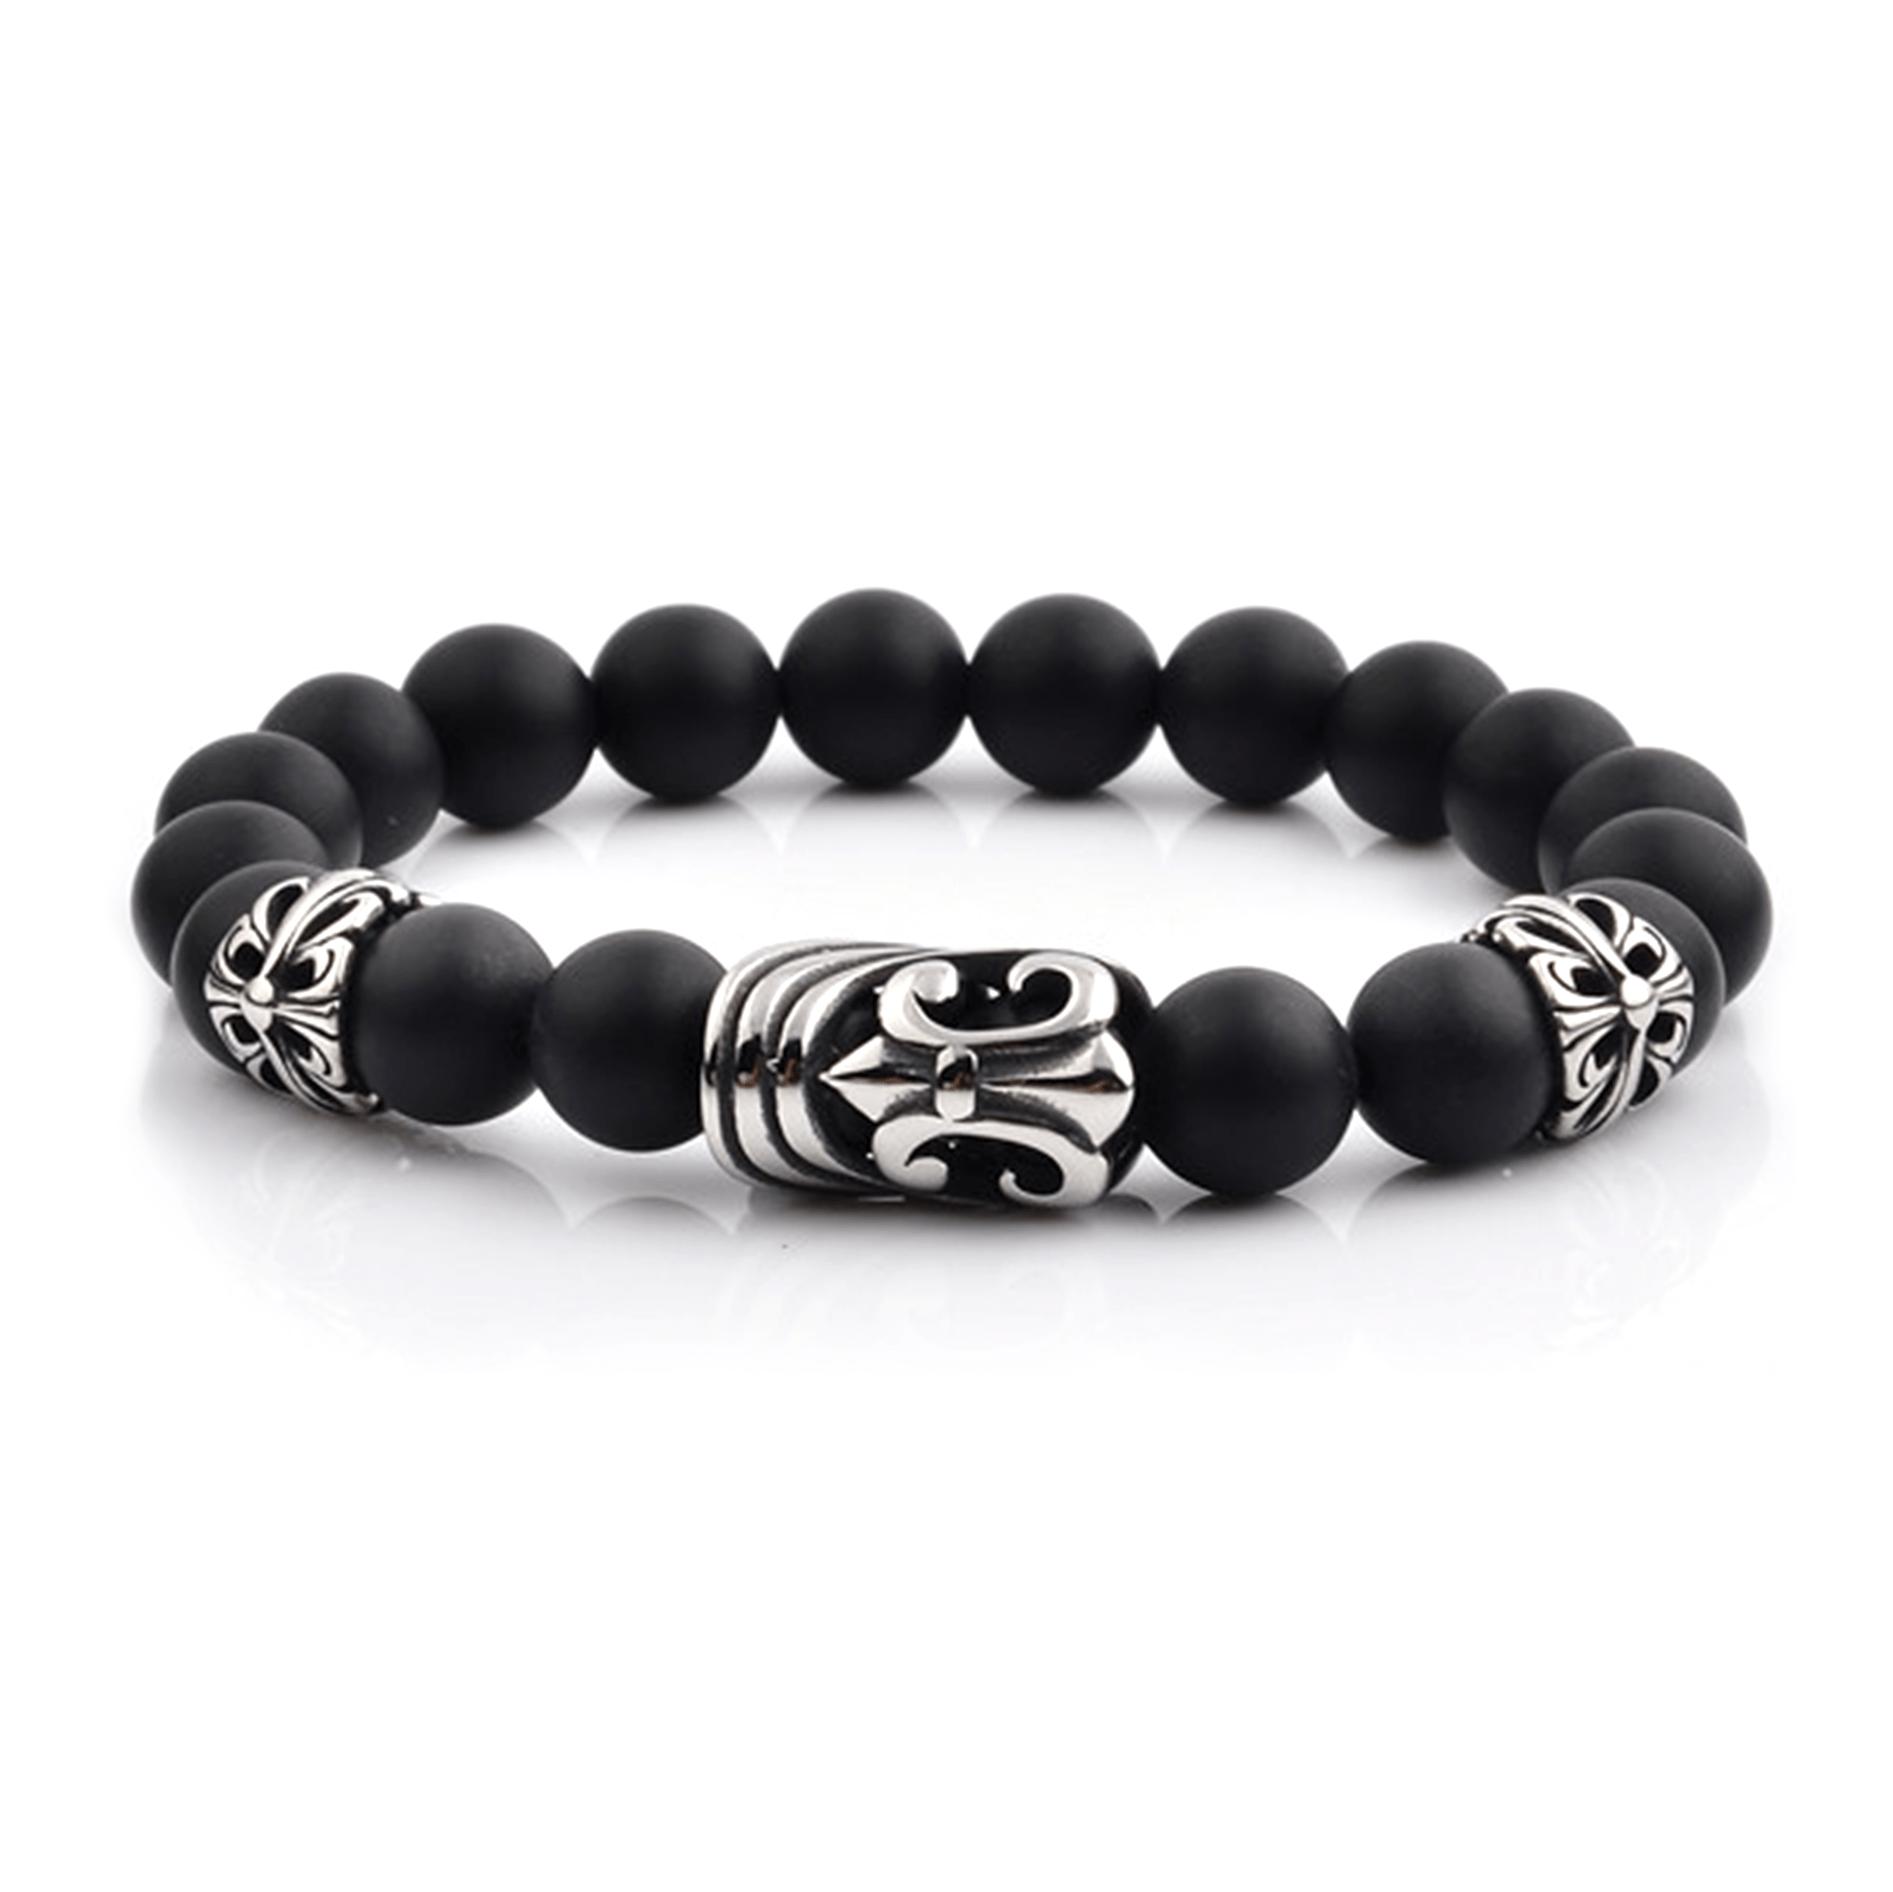 HYLIZO X Series 023 - Black Matte Beaded bracelet with 316 Stainless Steel Luxury Engraving